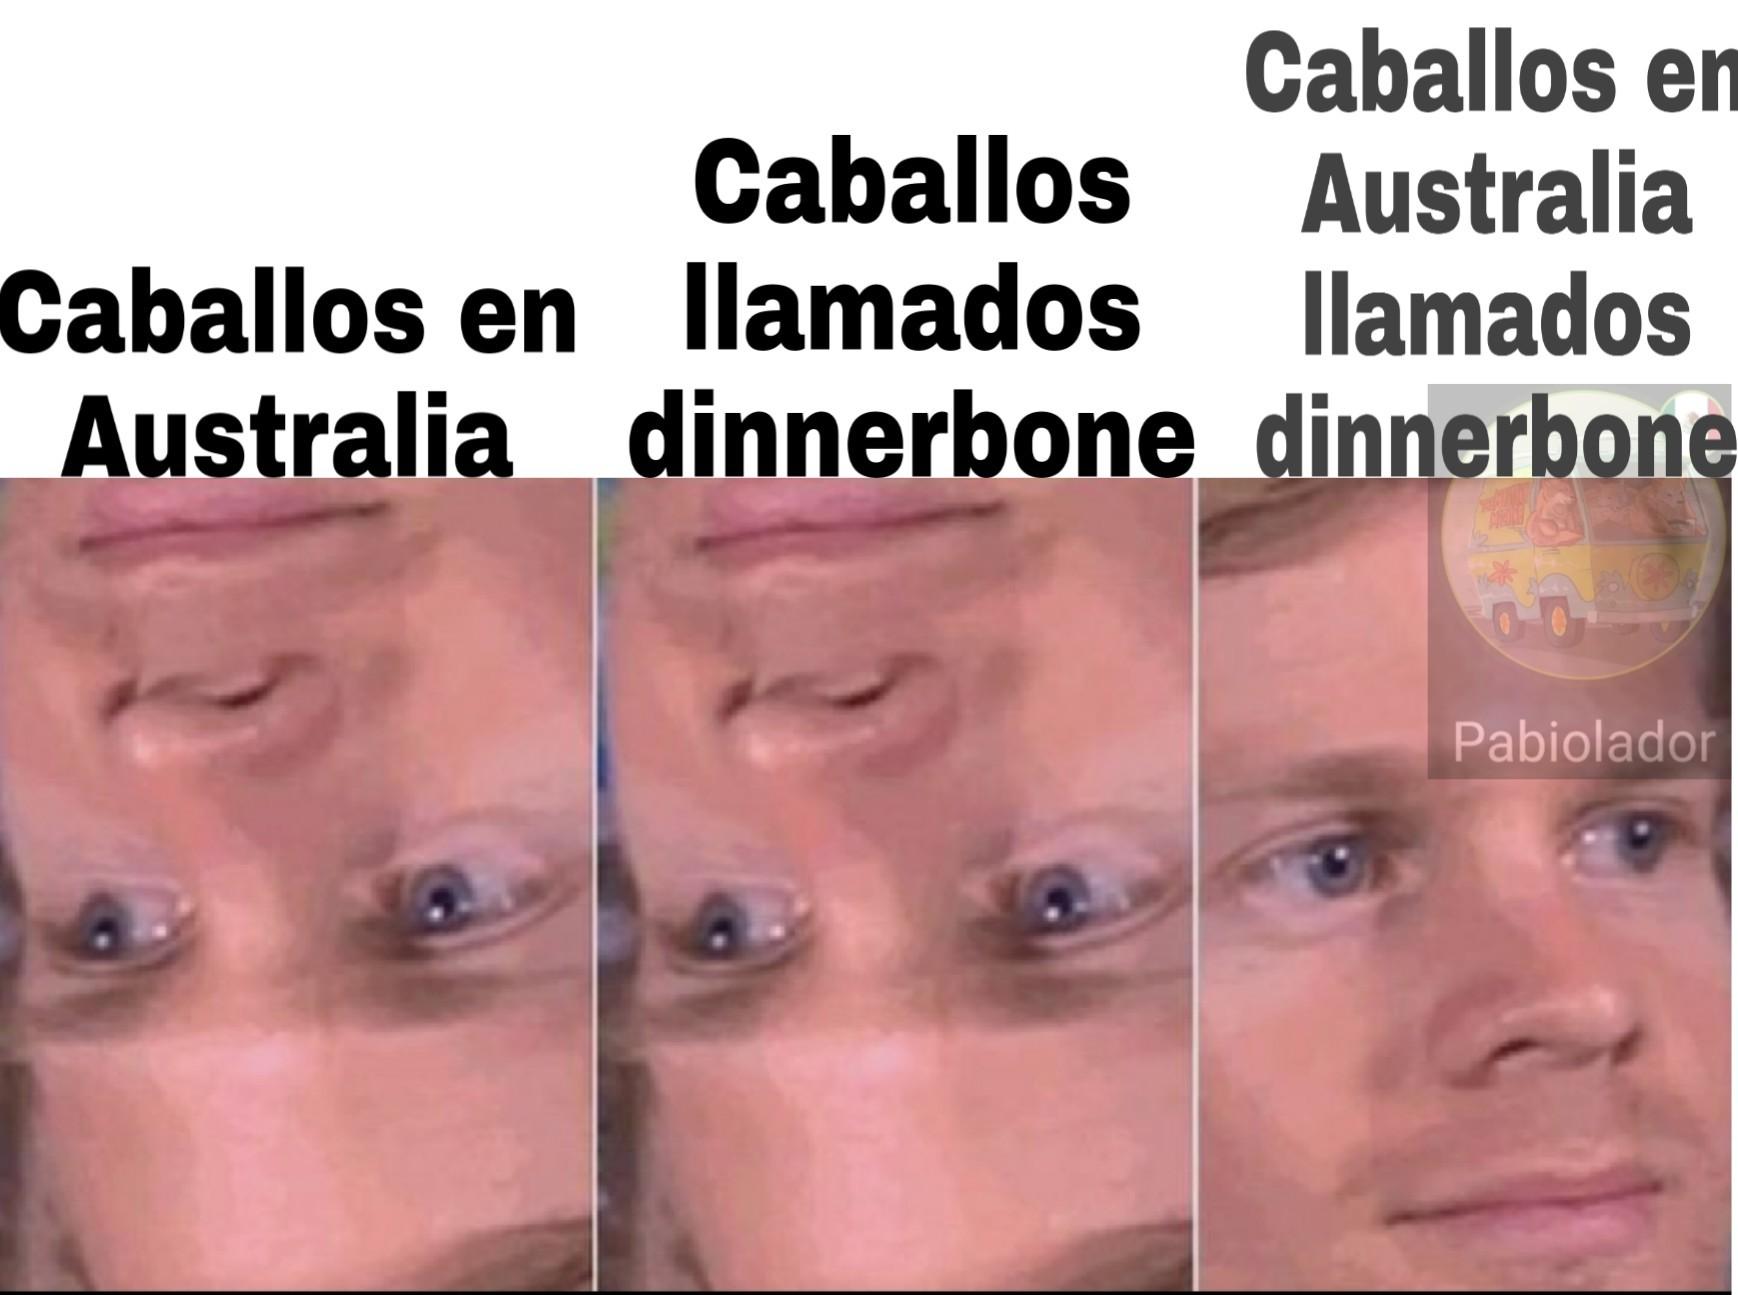 Dinnerbone - meme